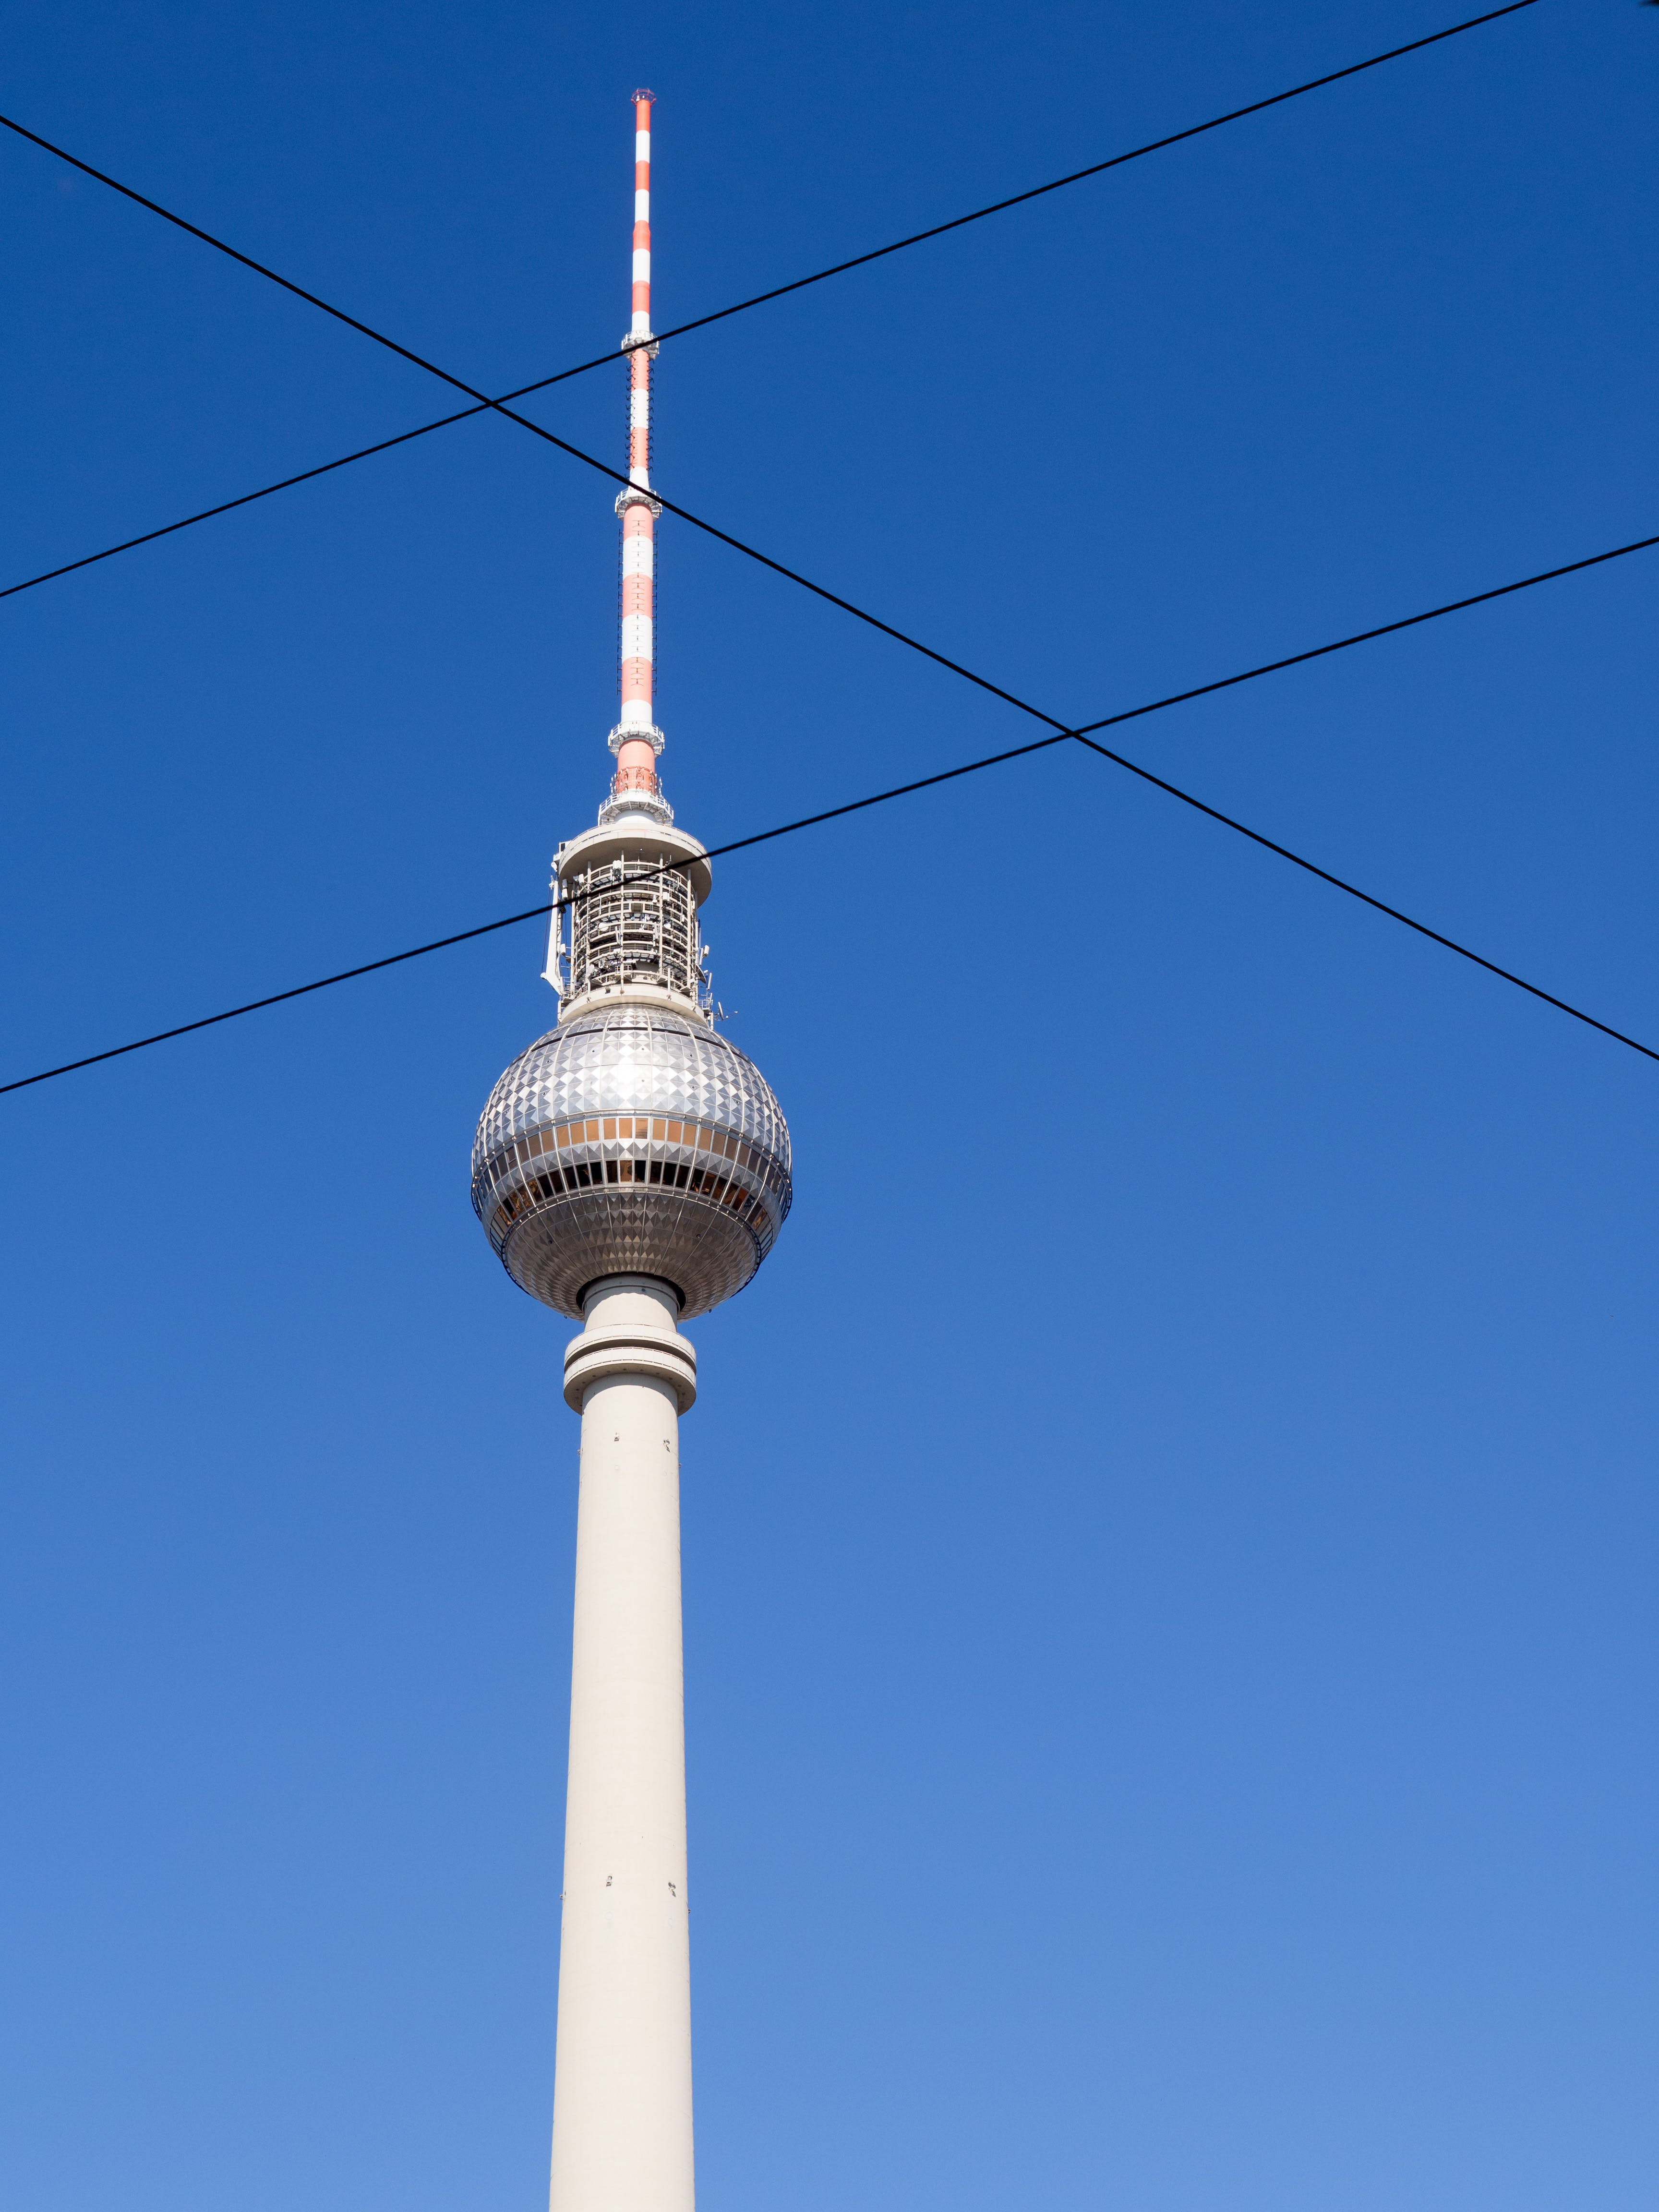 Free stock photo of blue sky, Alexanderplatz, tv tower, simplicity